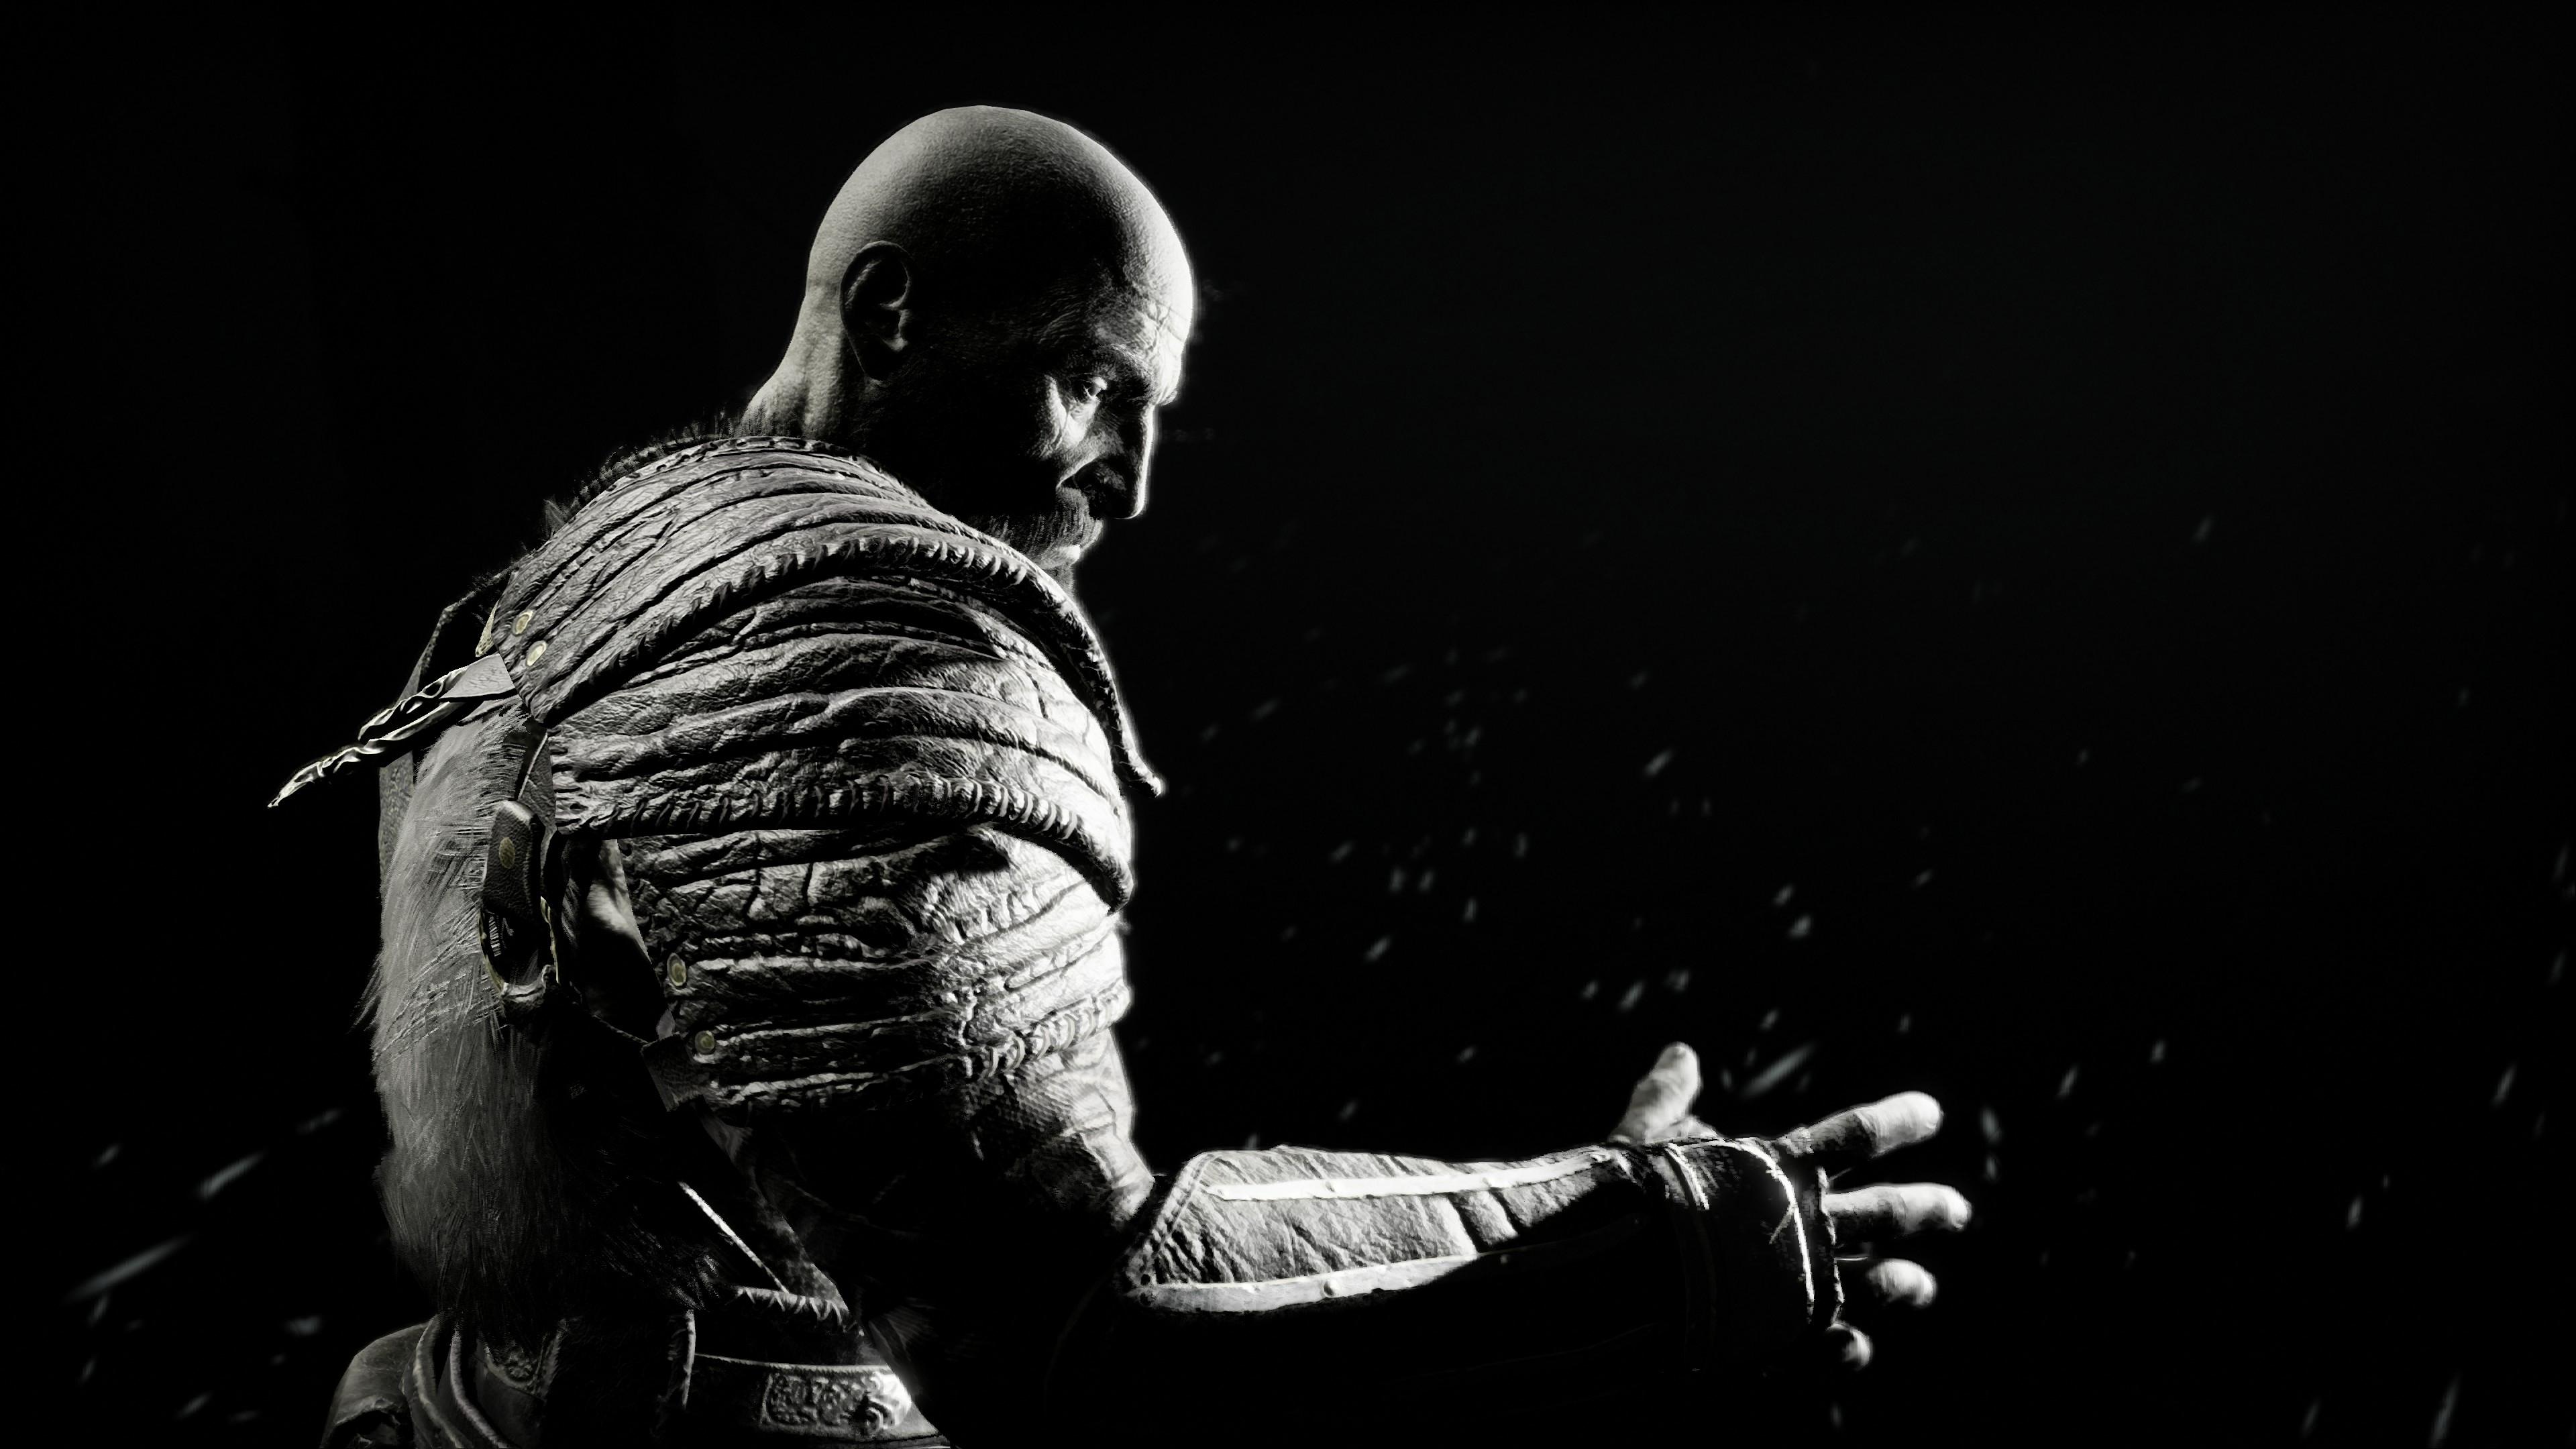 kratos-in-god-of-war-4k-yr.jpg